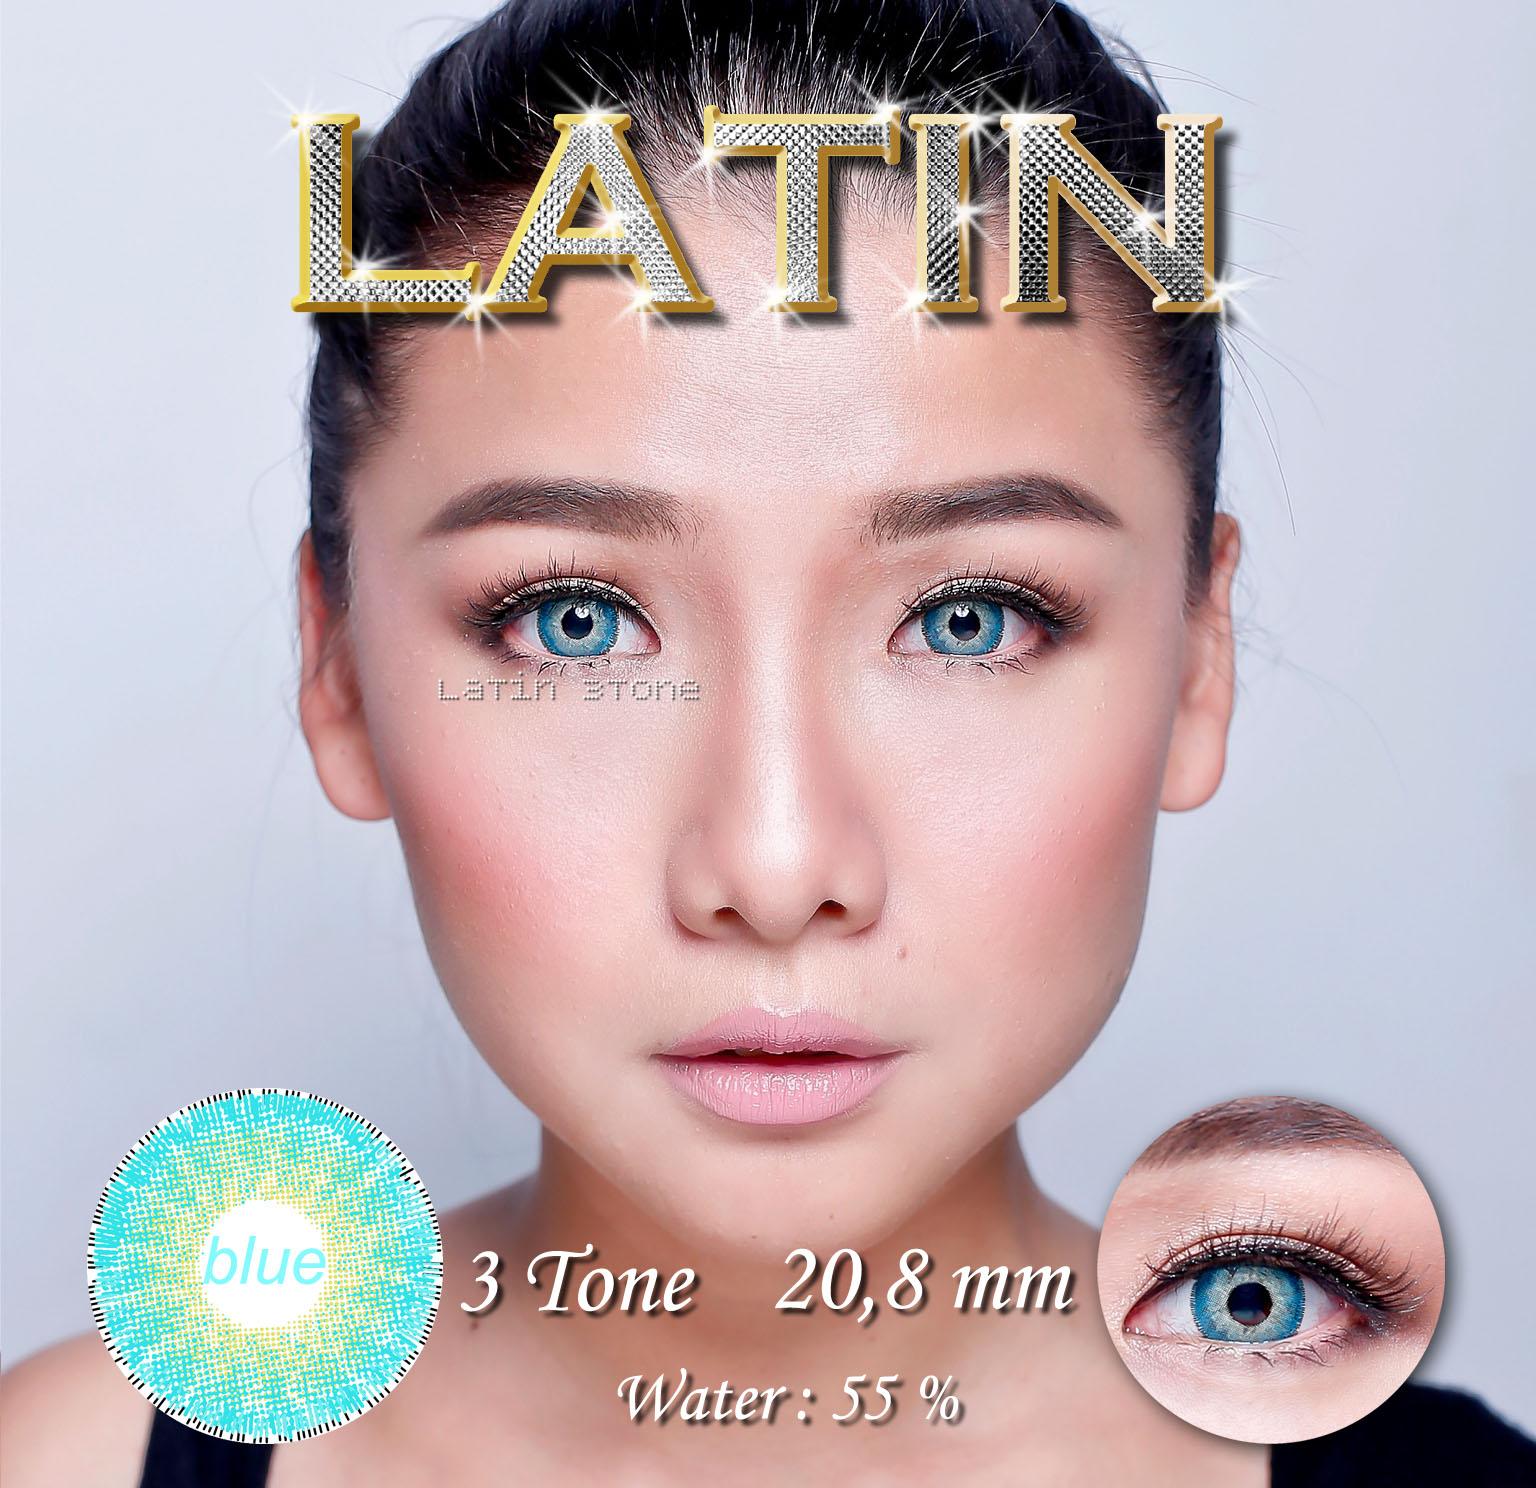 Gratis Lenscase Cairan Soflens Source latin 3 Tones best Seller 2016 elevenia .